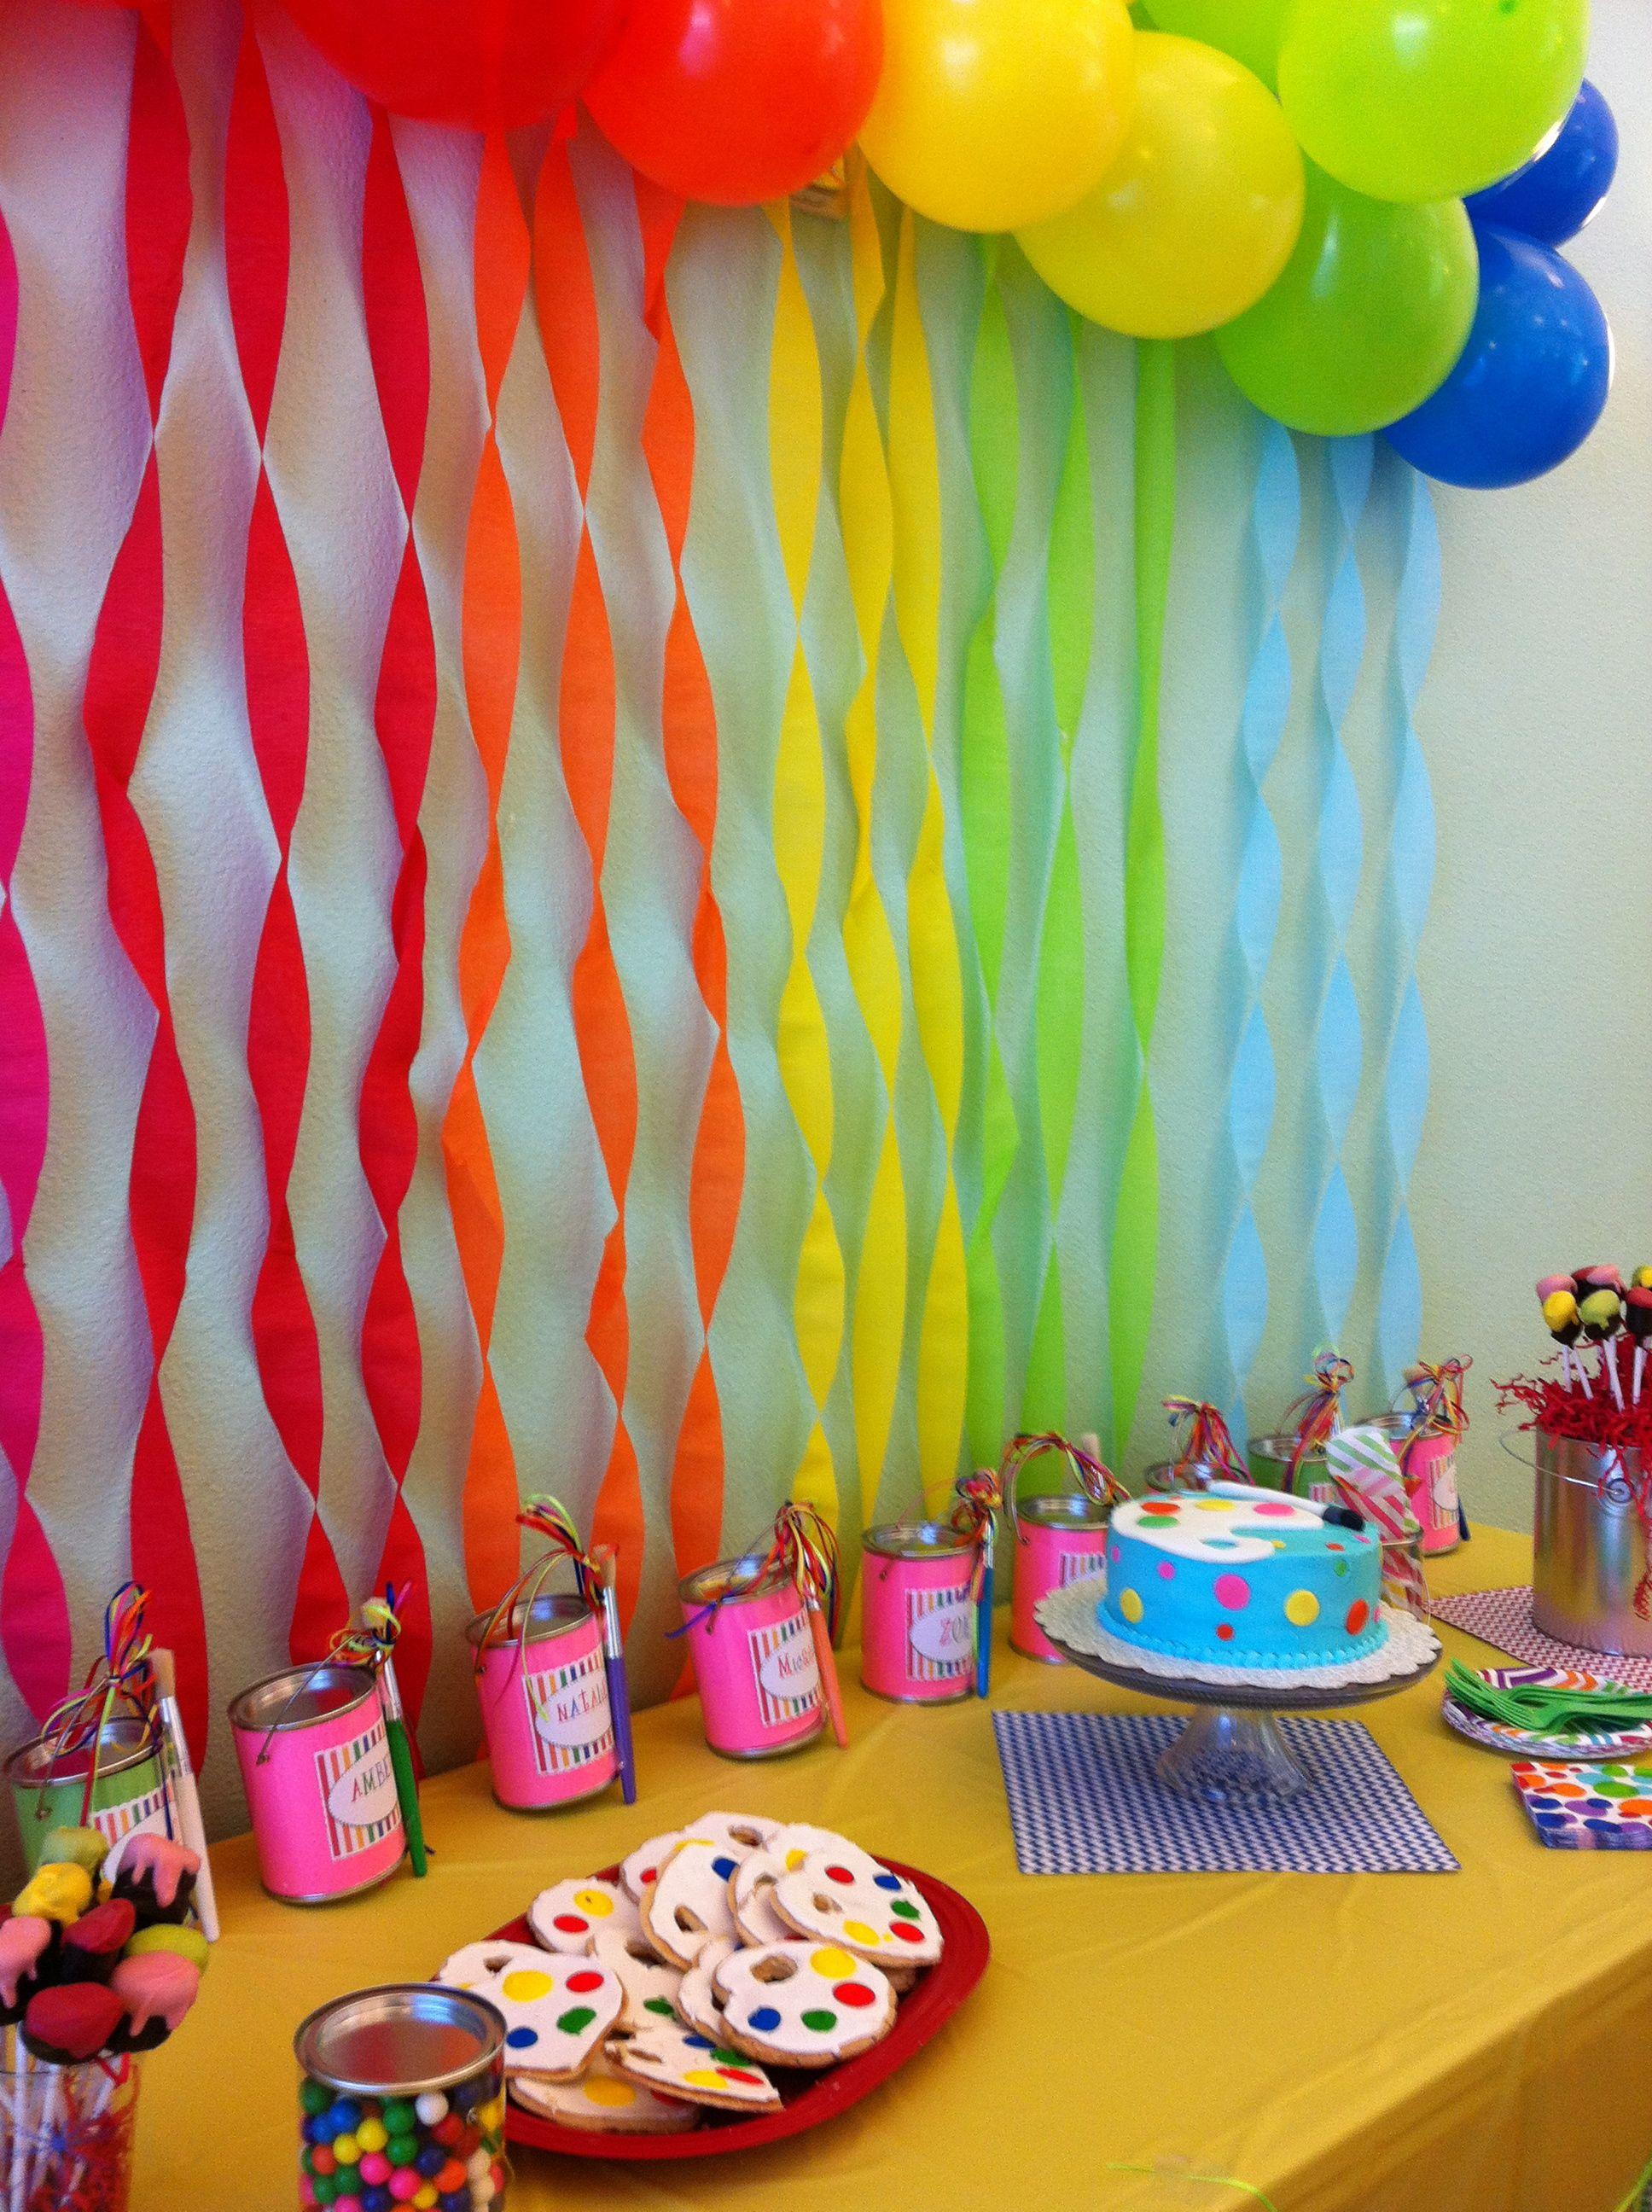 8 Year Old Girl Birthday Art Party Artist Birthday Party